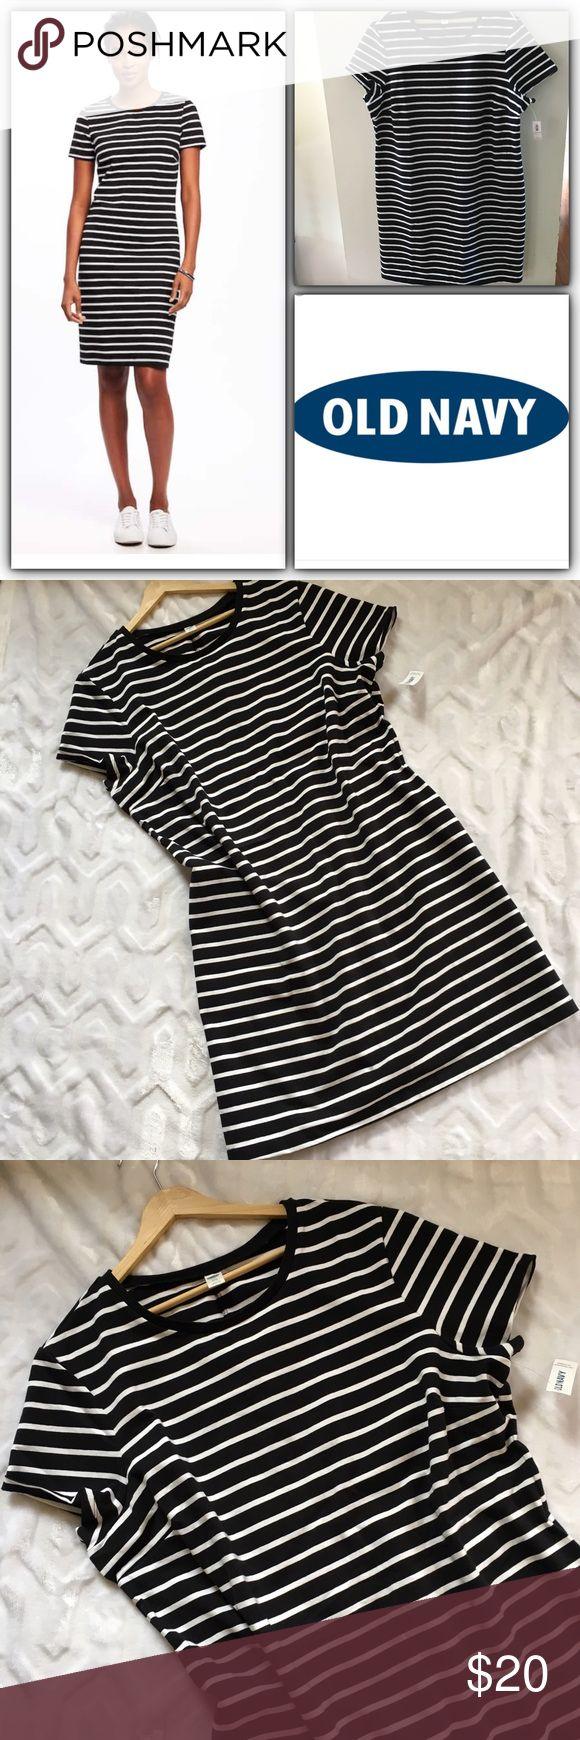 Black t shirt old navy - Nwt Old Navy Black And White Stripe T Shirt Dress Nwt